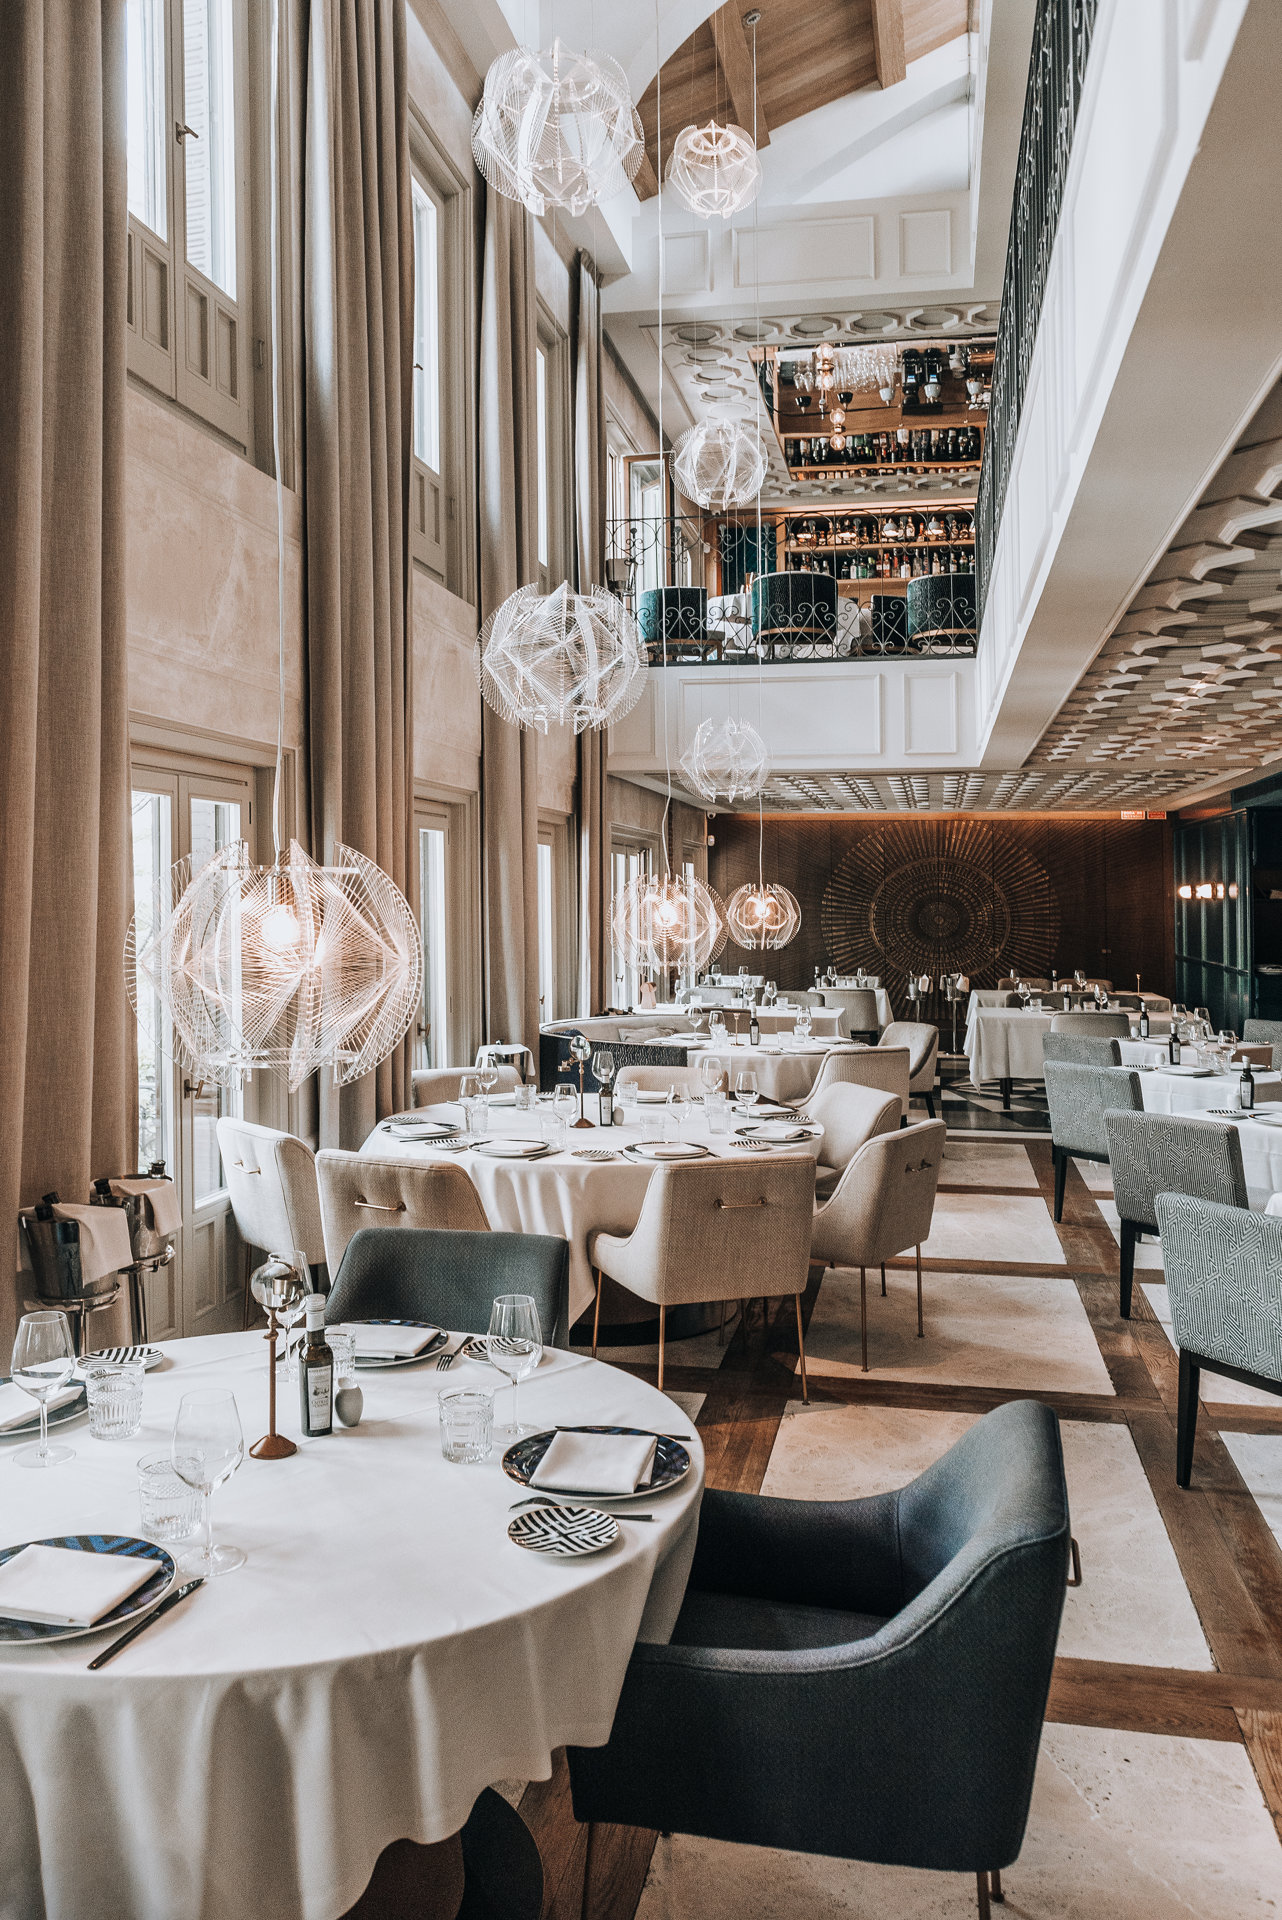 Fotógrafo de interiorismo Madrid, fotógrafo de restaurantes, lux madrid, grupo la máquina